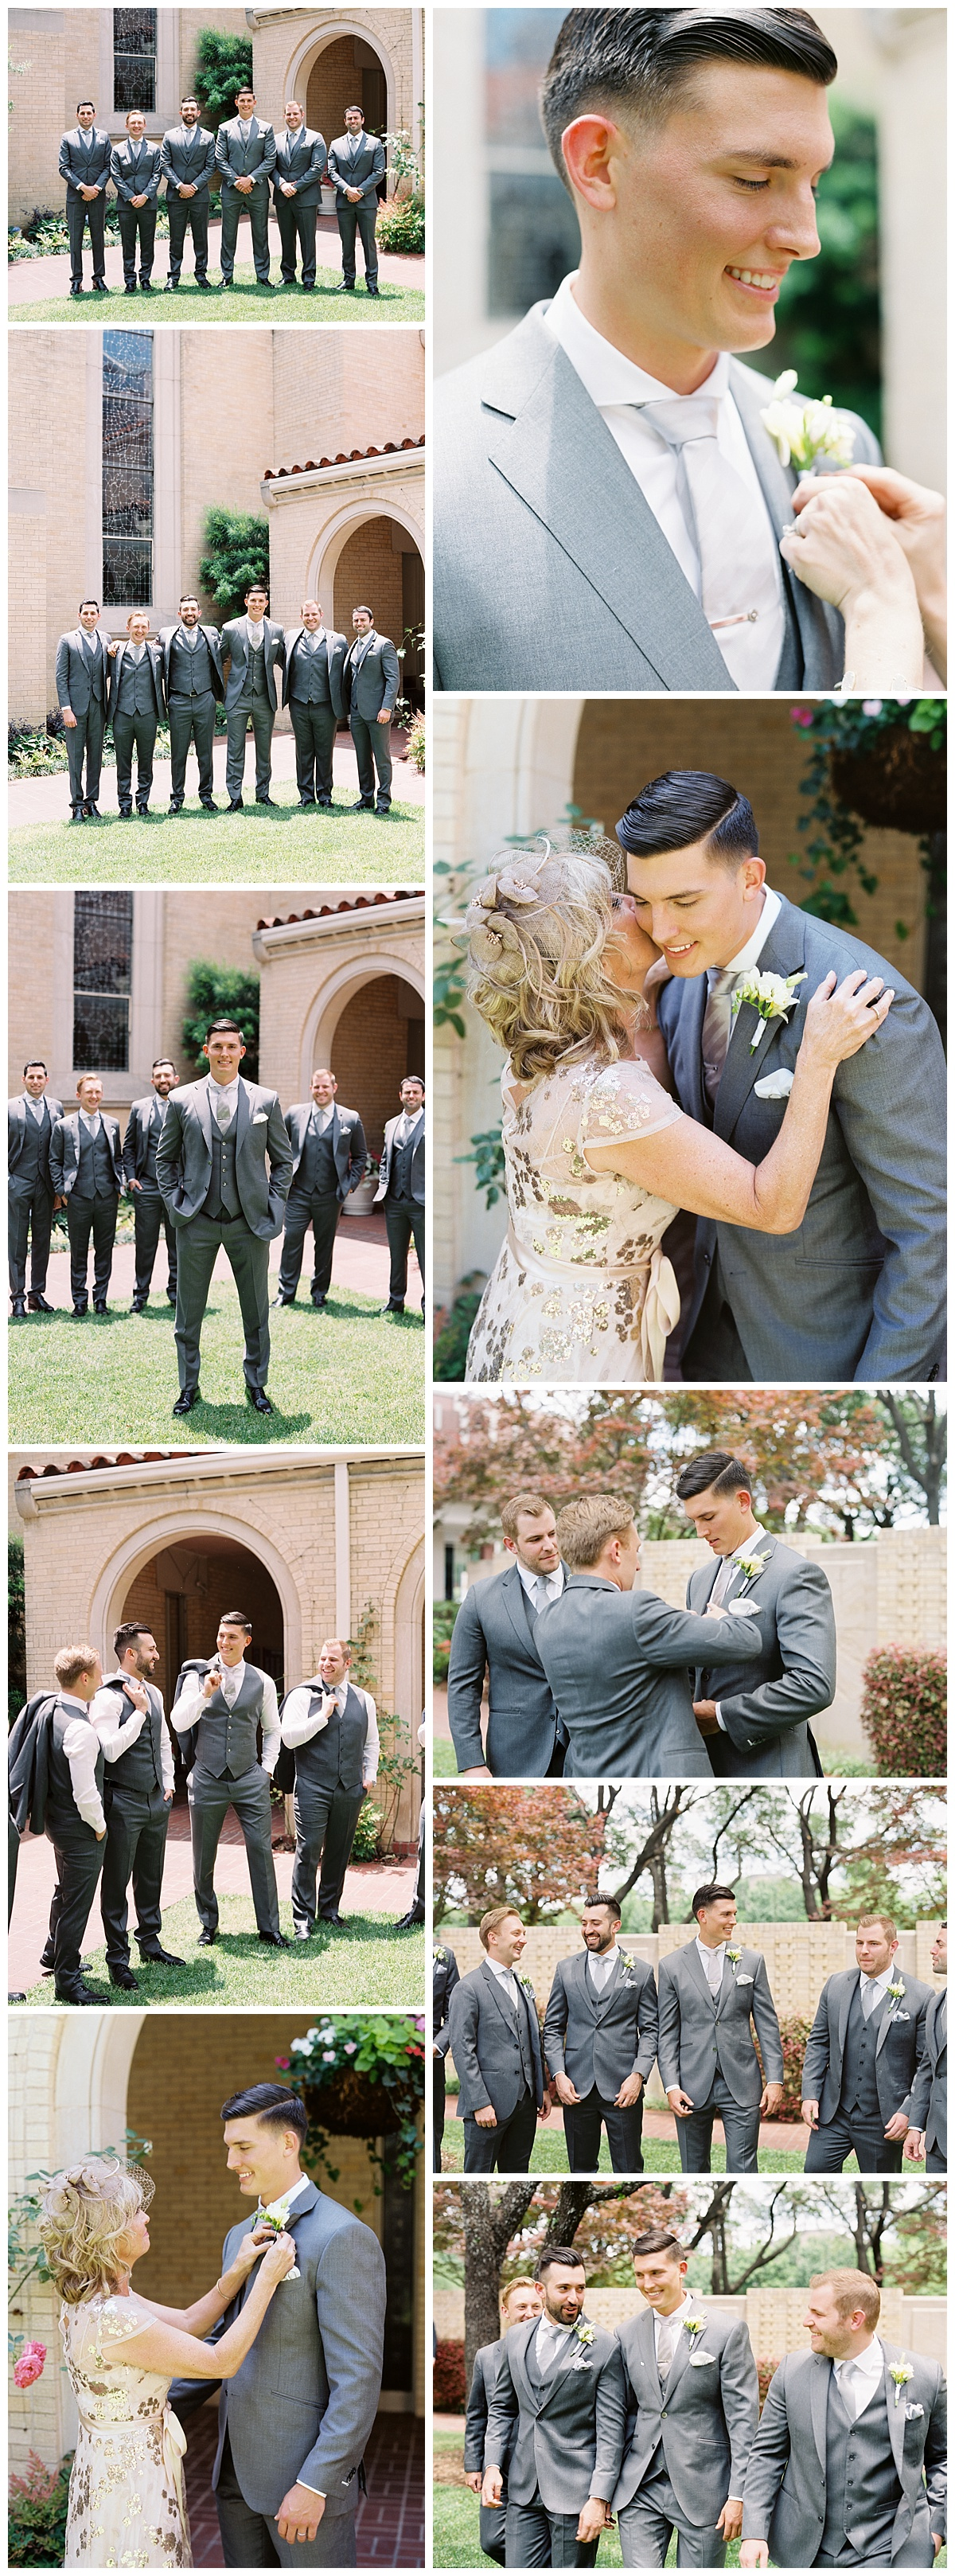 christ-the-king-catholic-church-wedding-ar-photography-1.jpg